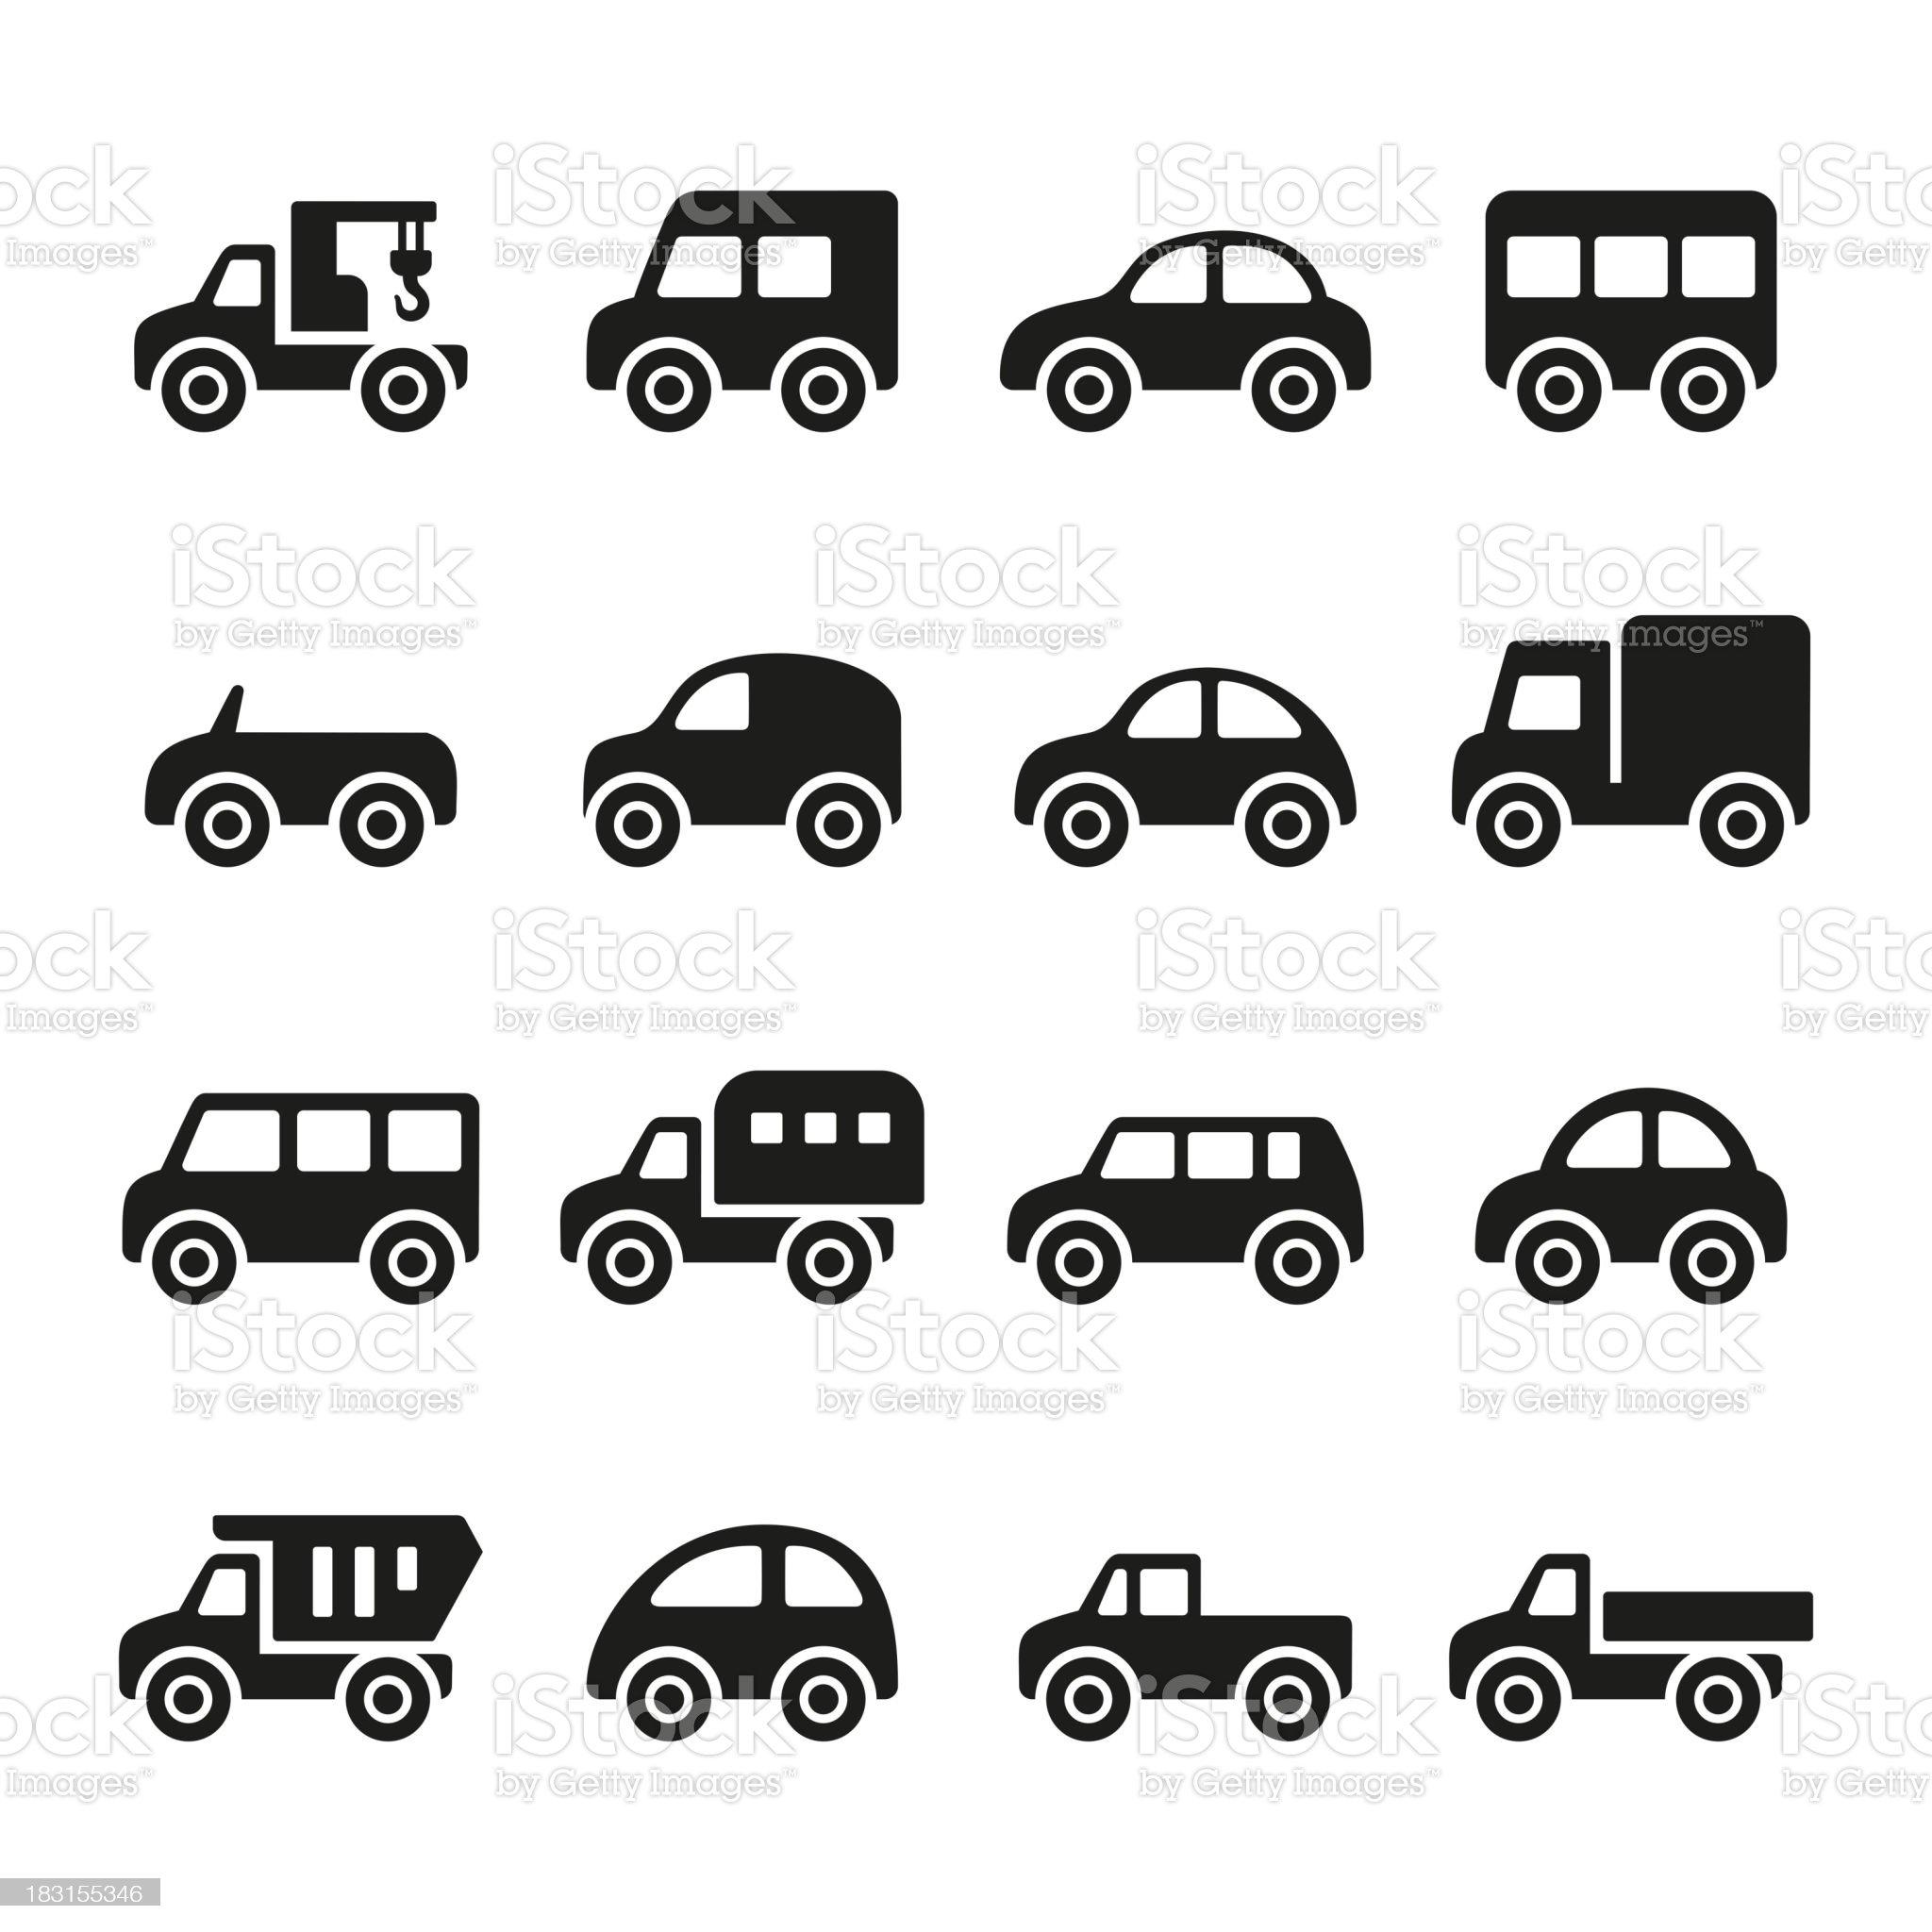 Cars icon set royalty-free stock vector art